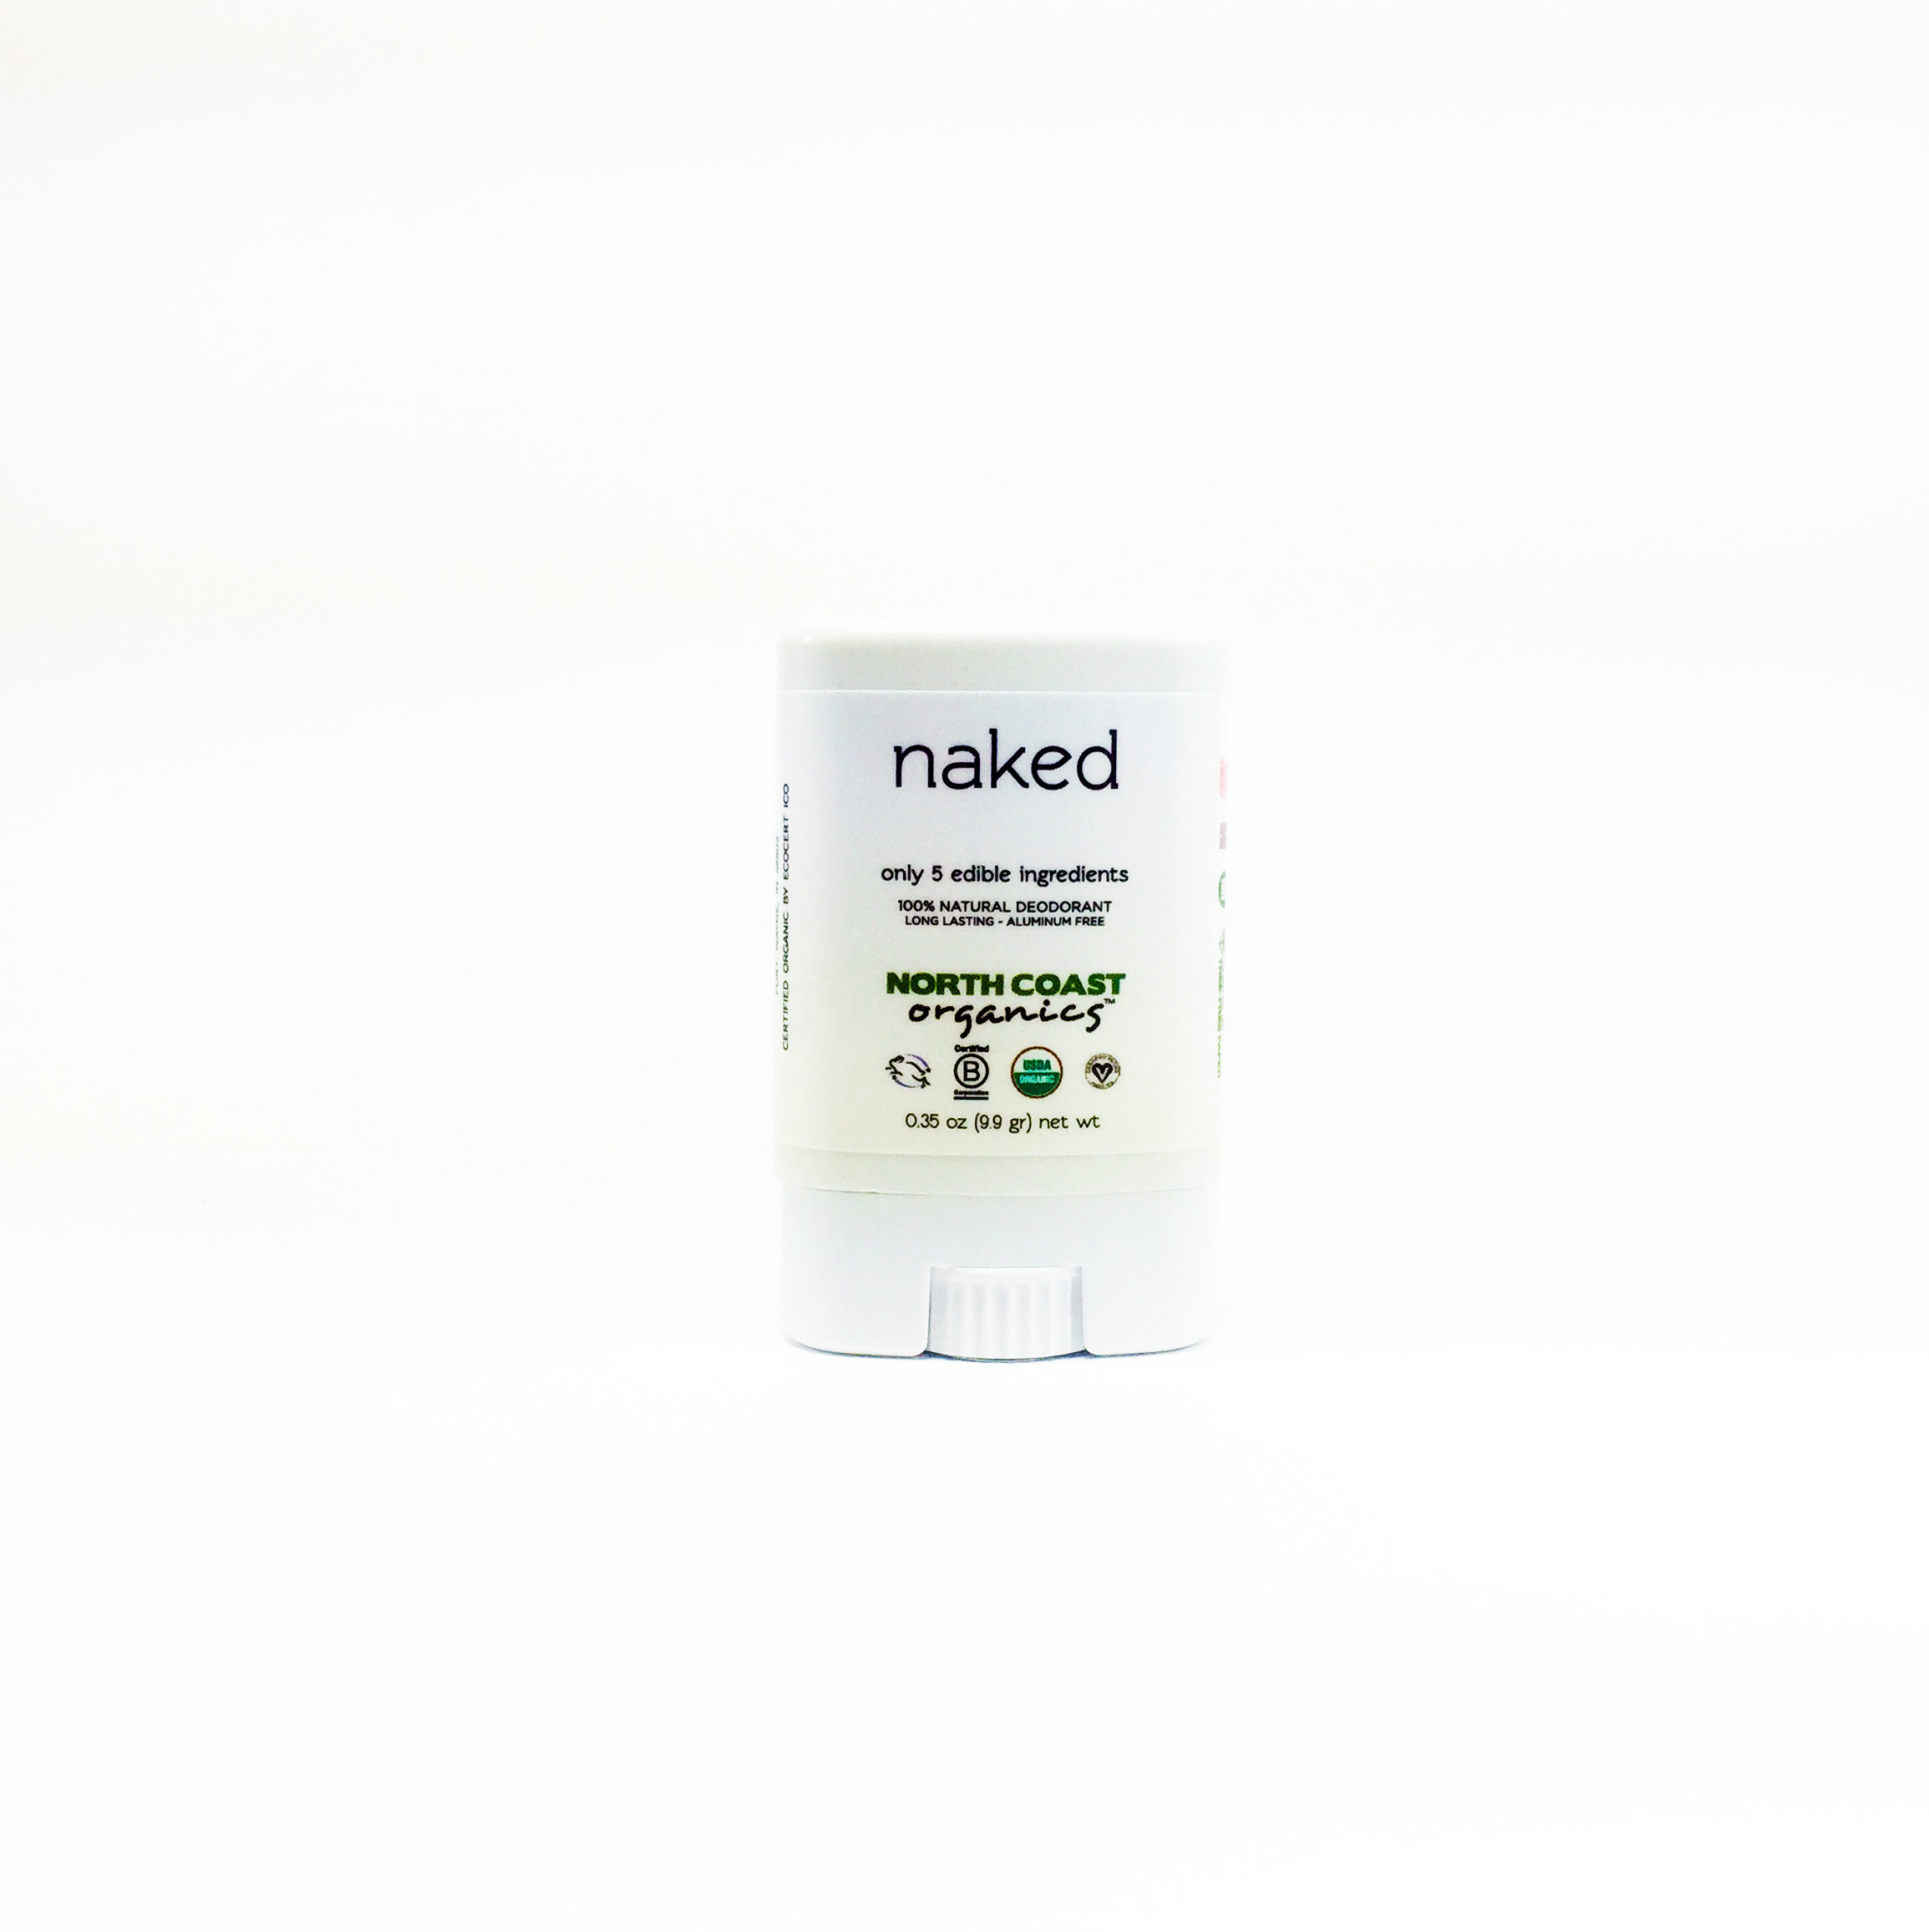 naked - Travel Size Organic Deodorant 0.35 oz 2003